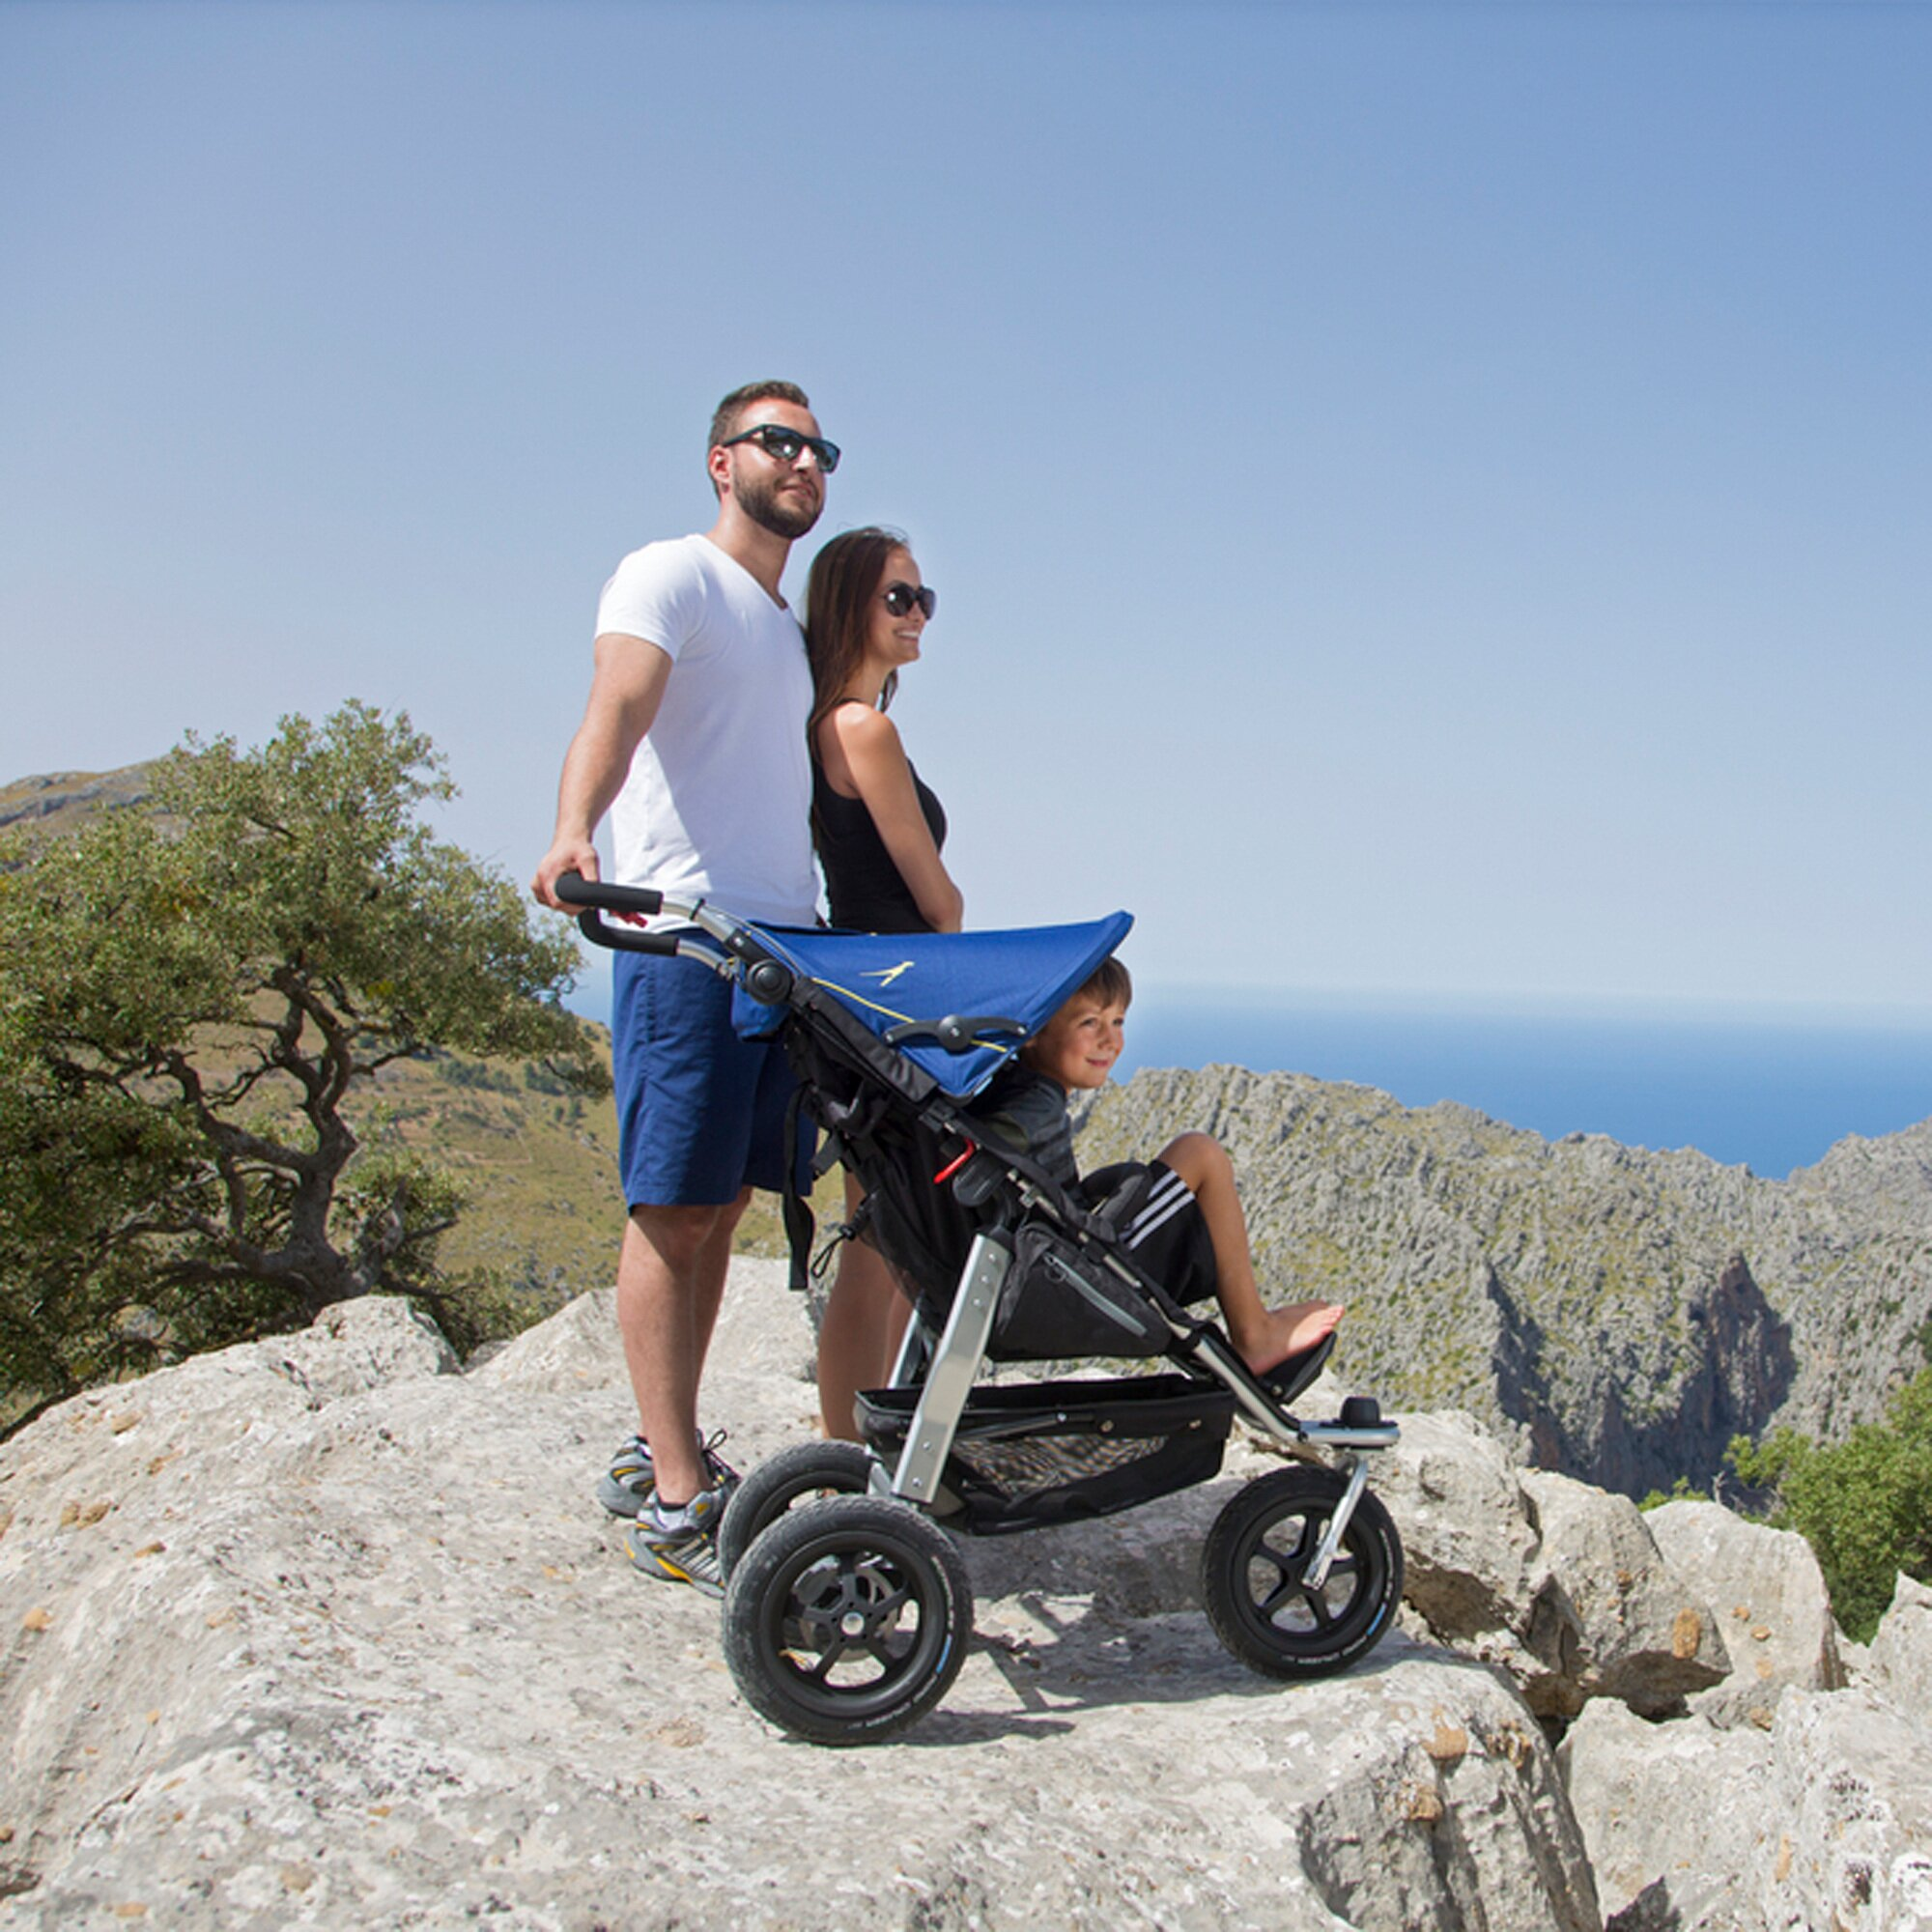 tfk-joggster-adventure-kinderwagen-sportwagen-blau